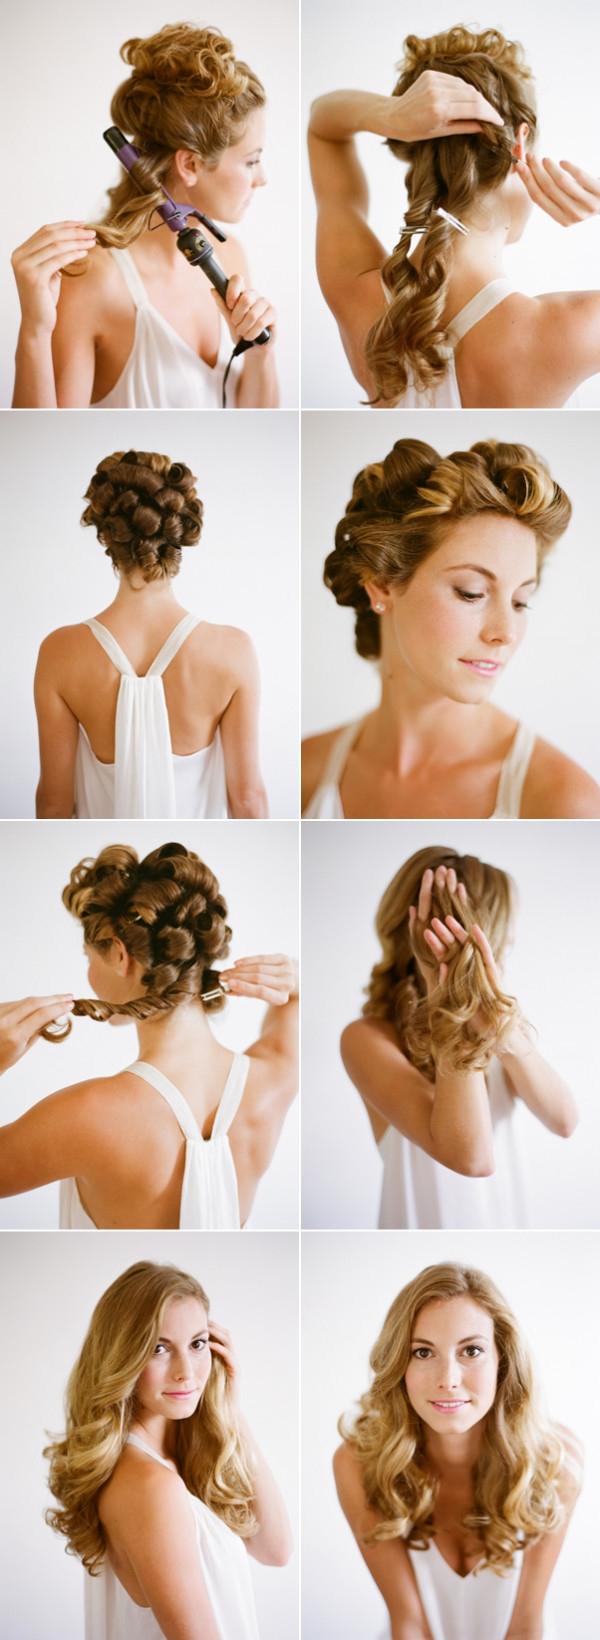 Tutorial Peinado Suelto Con Ondas Para Novias E Invitadas